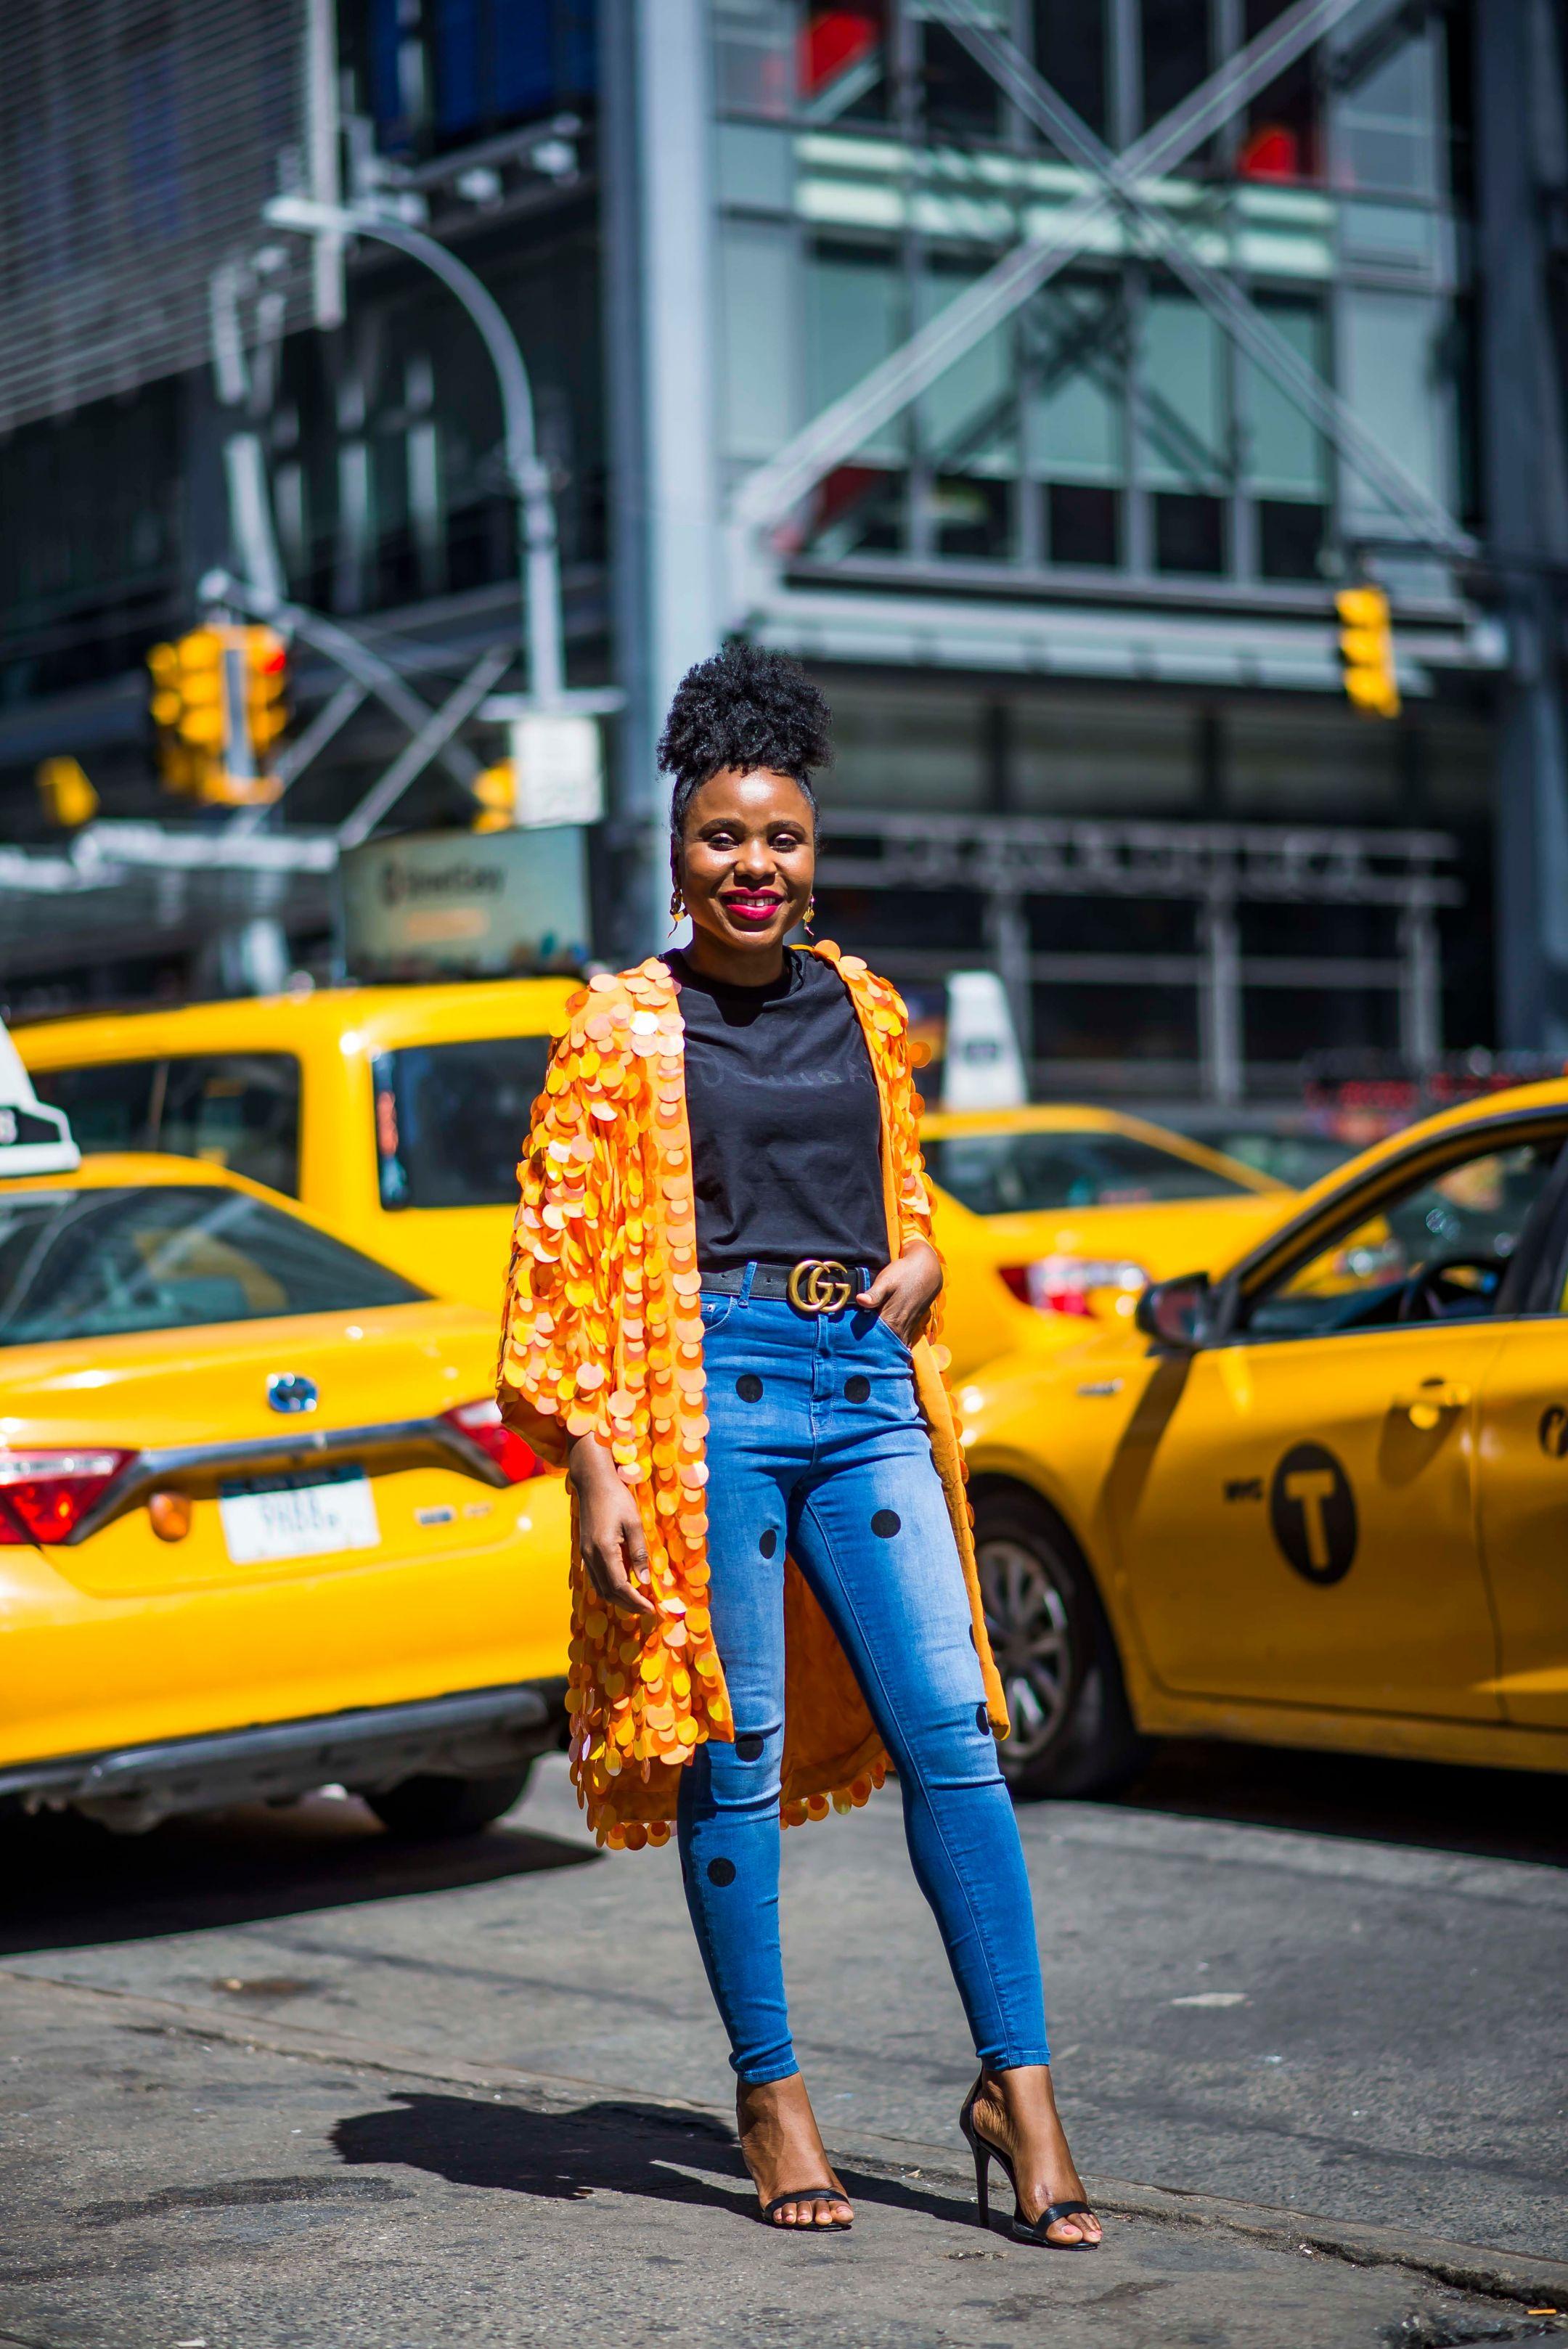 NYC street style